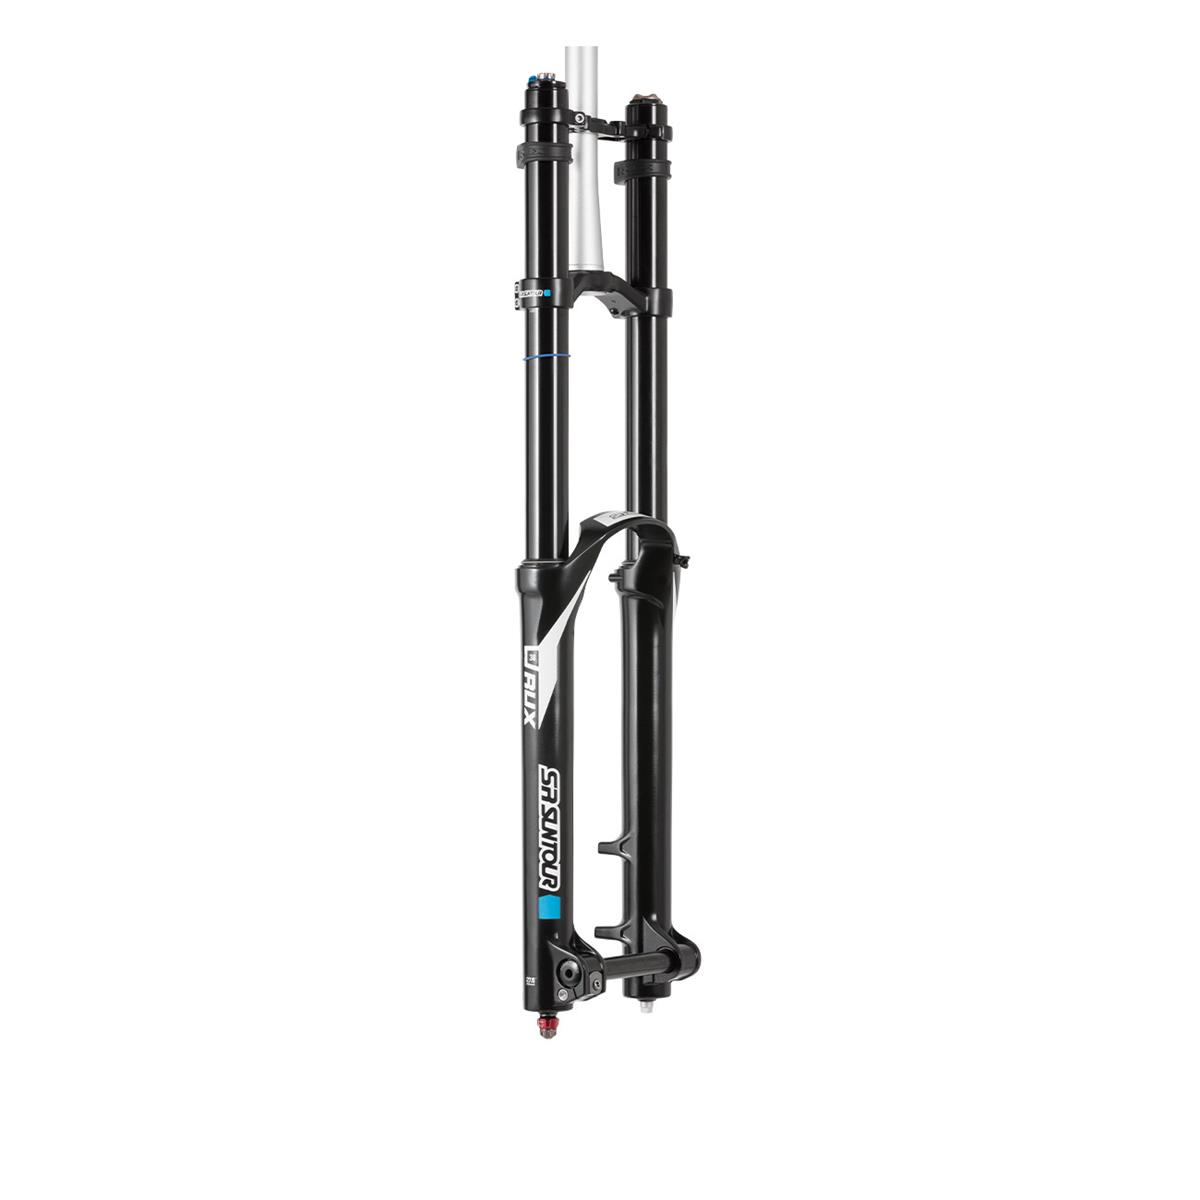 Suntour Federgabel RUX R2C2 BOOST 27.5 Zoll | PCS | Luftfeder | 20 mm Tooltype Steckachse | tapered